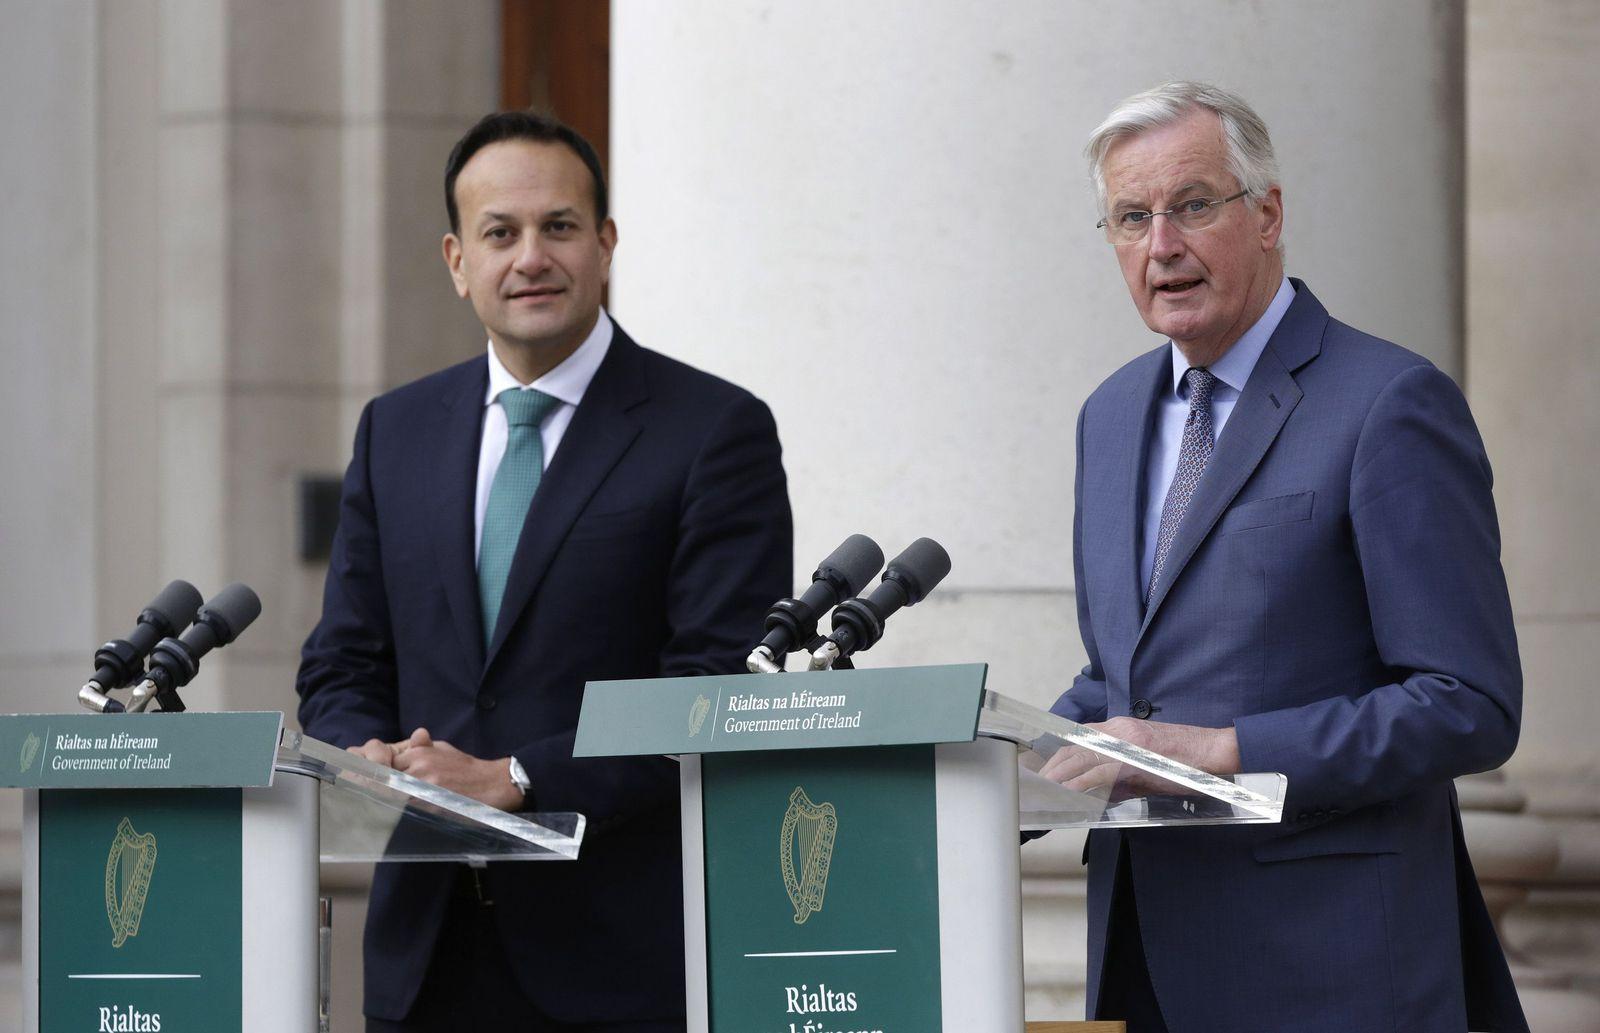 General Election Ireland 2020